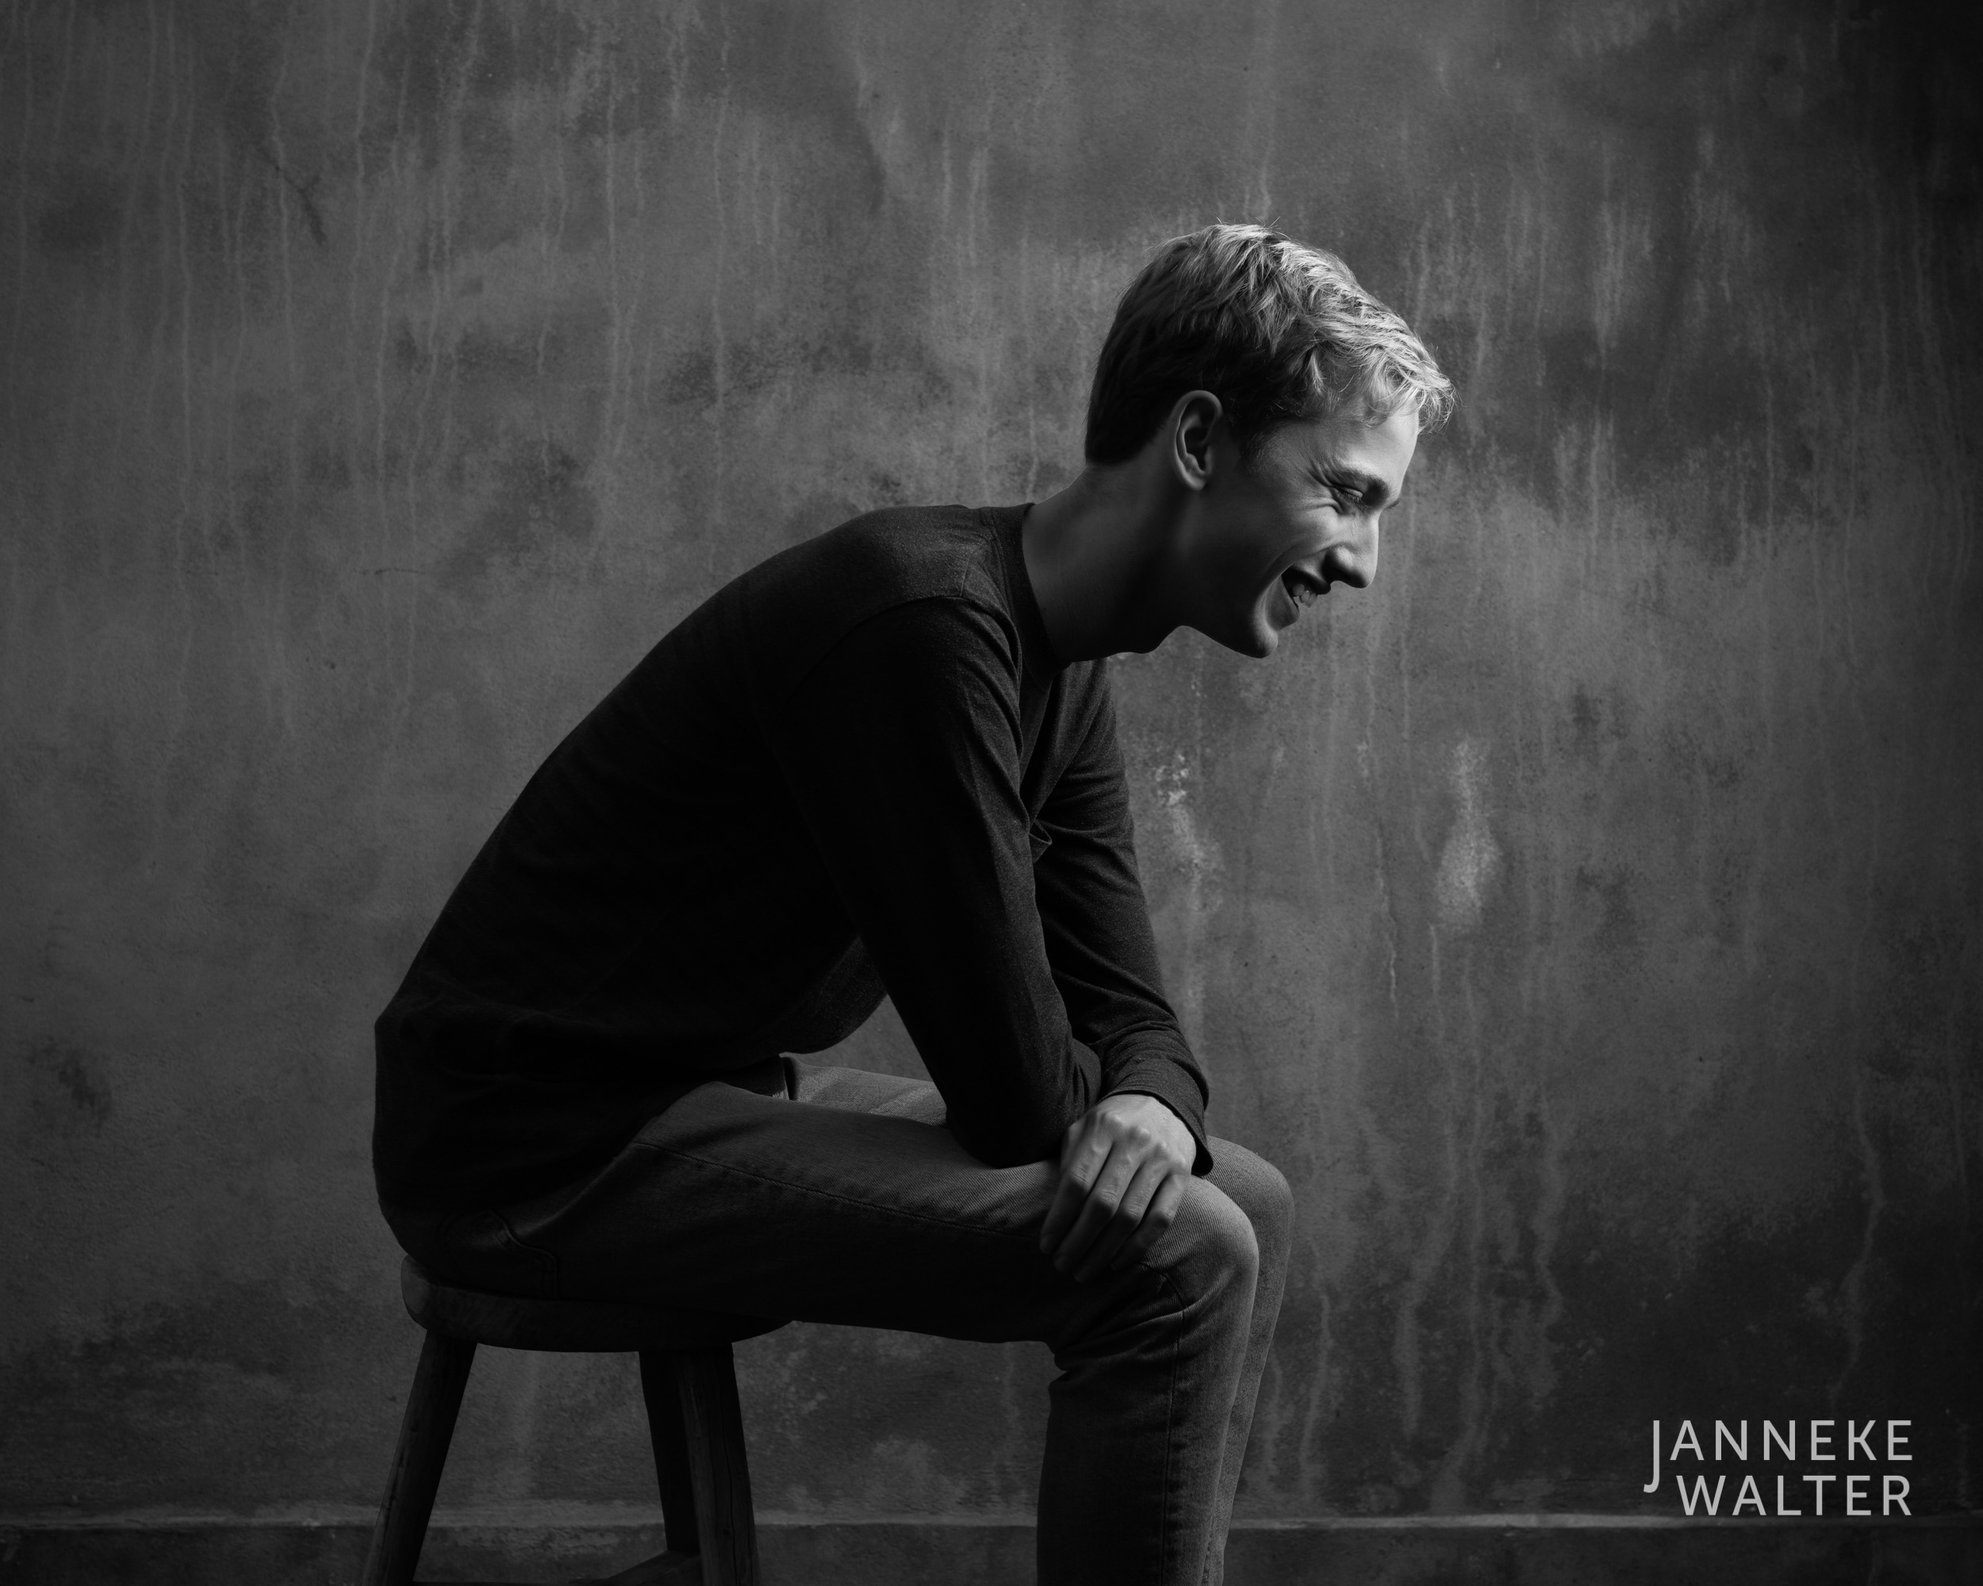 Fine art portretfoto jongen op kruk @ Janneke Walter, kinderfotograaf Utrecht De Bilt, kinderfotografie, kinderportret, fine art fotografie